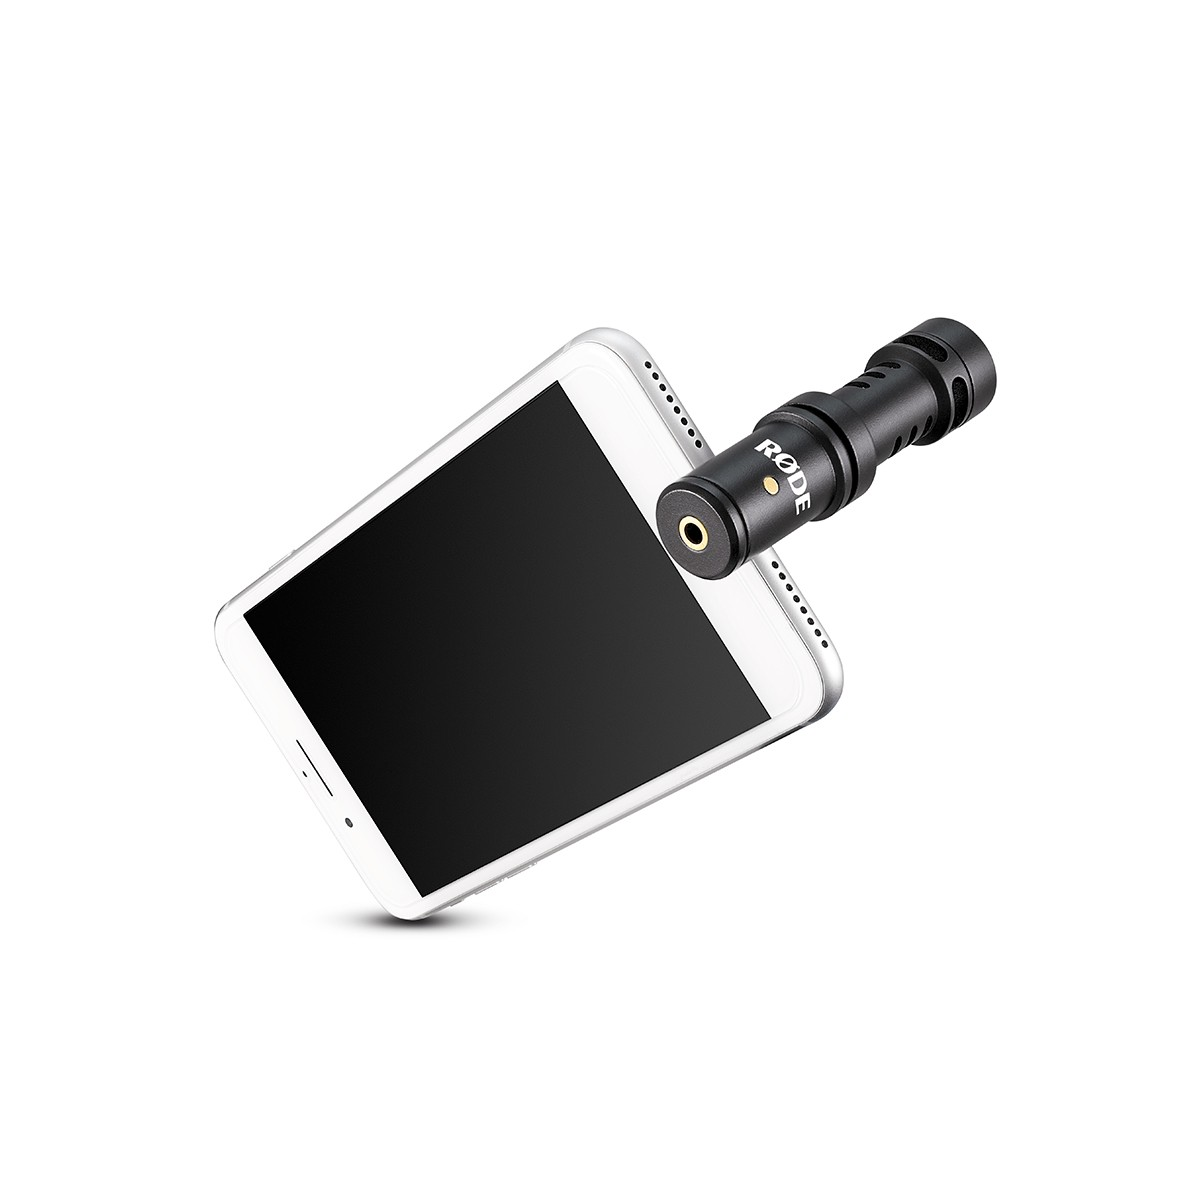 Microfone Mini Shotgun p/ Iphone, Ipad Rode Video Mic Me-L